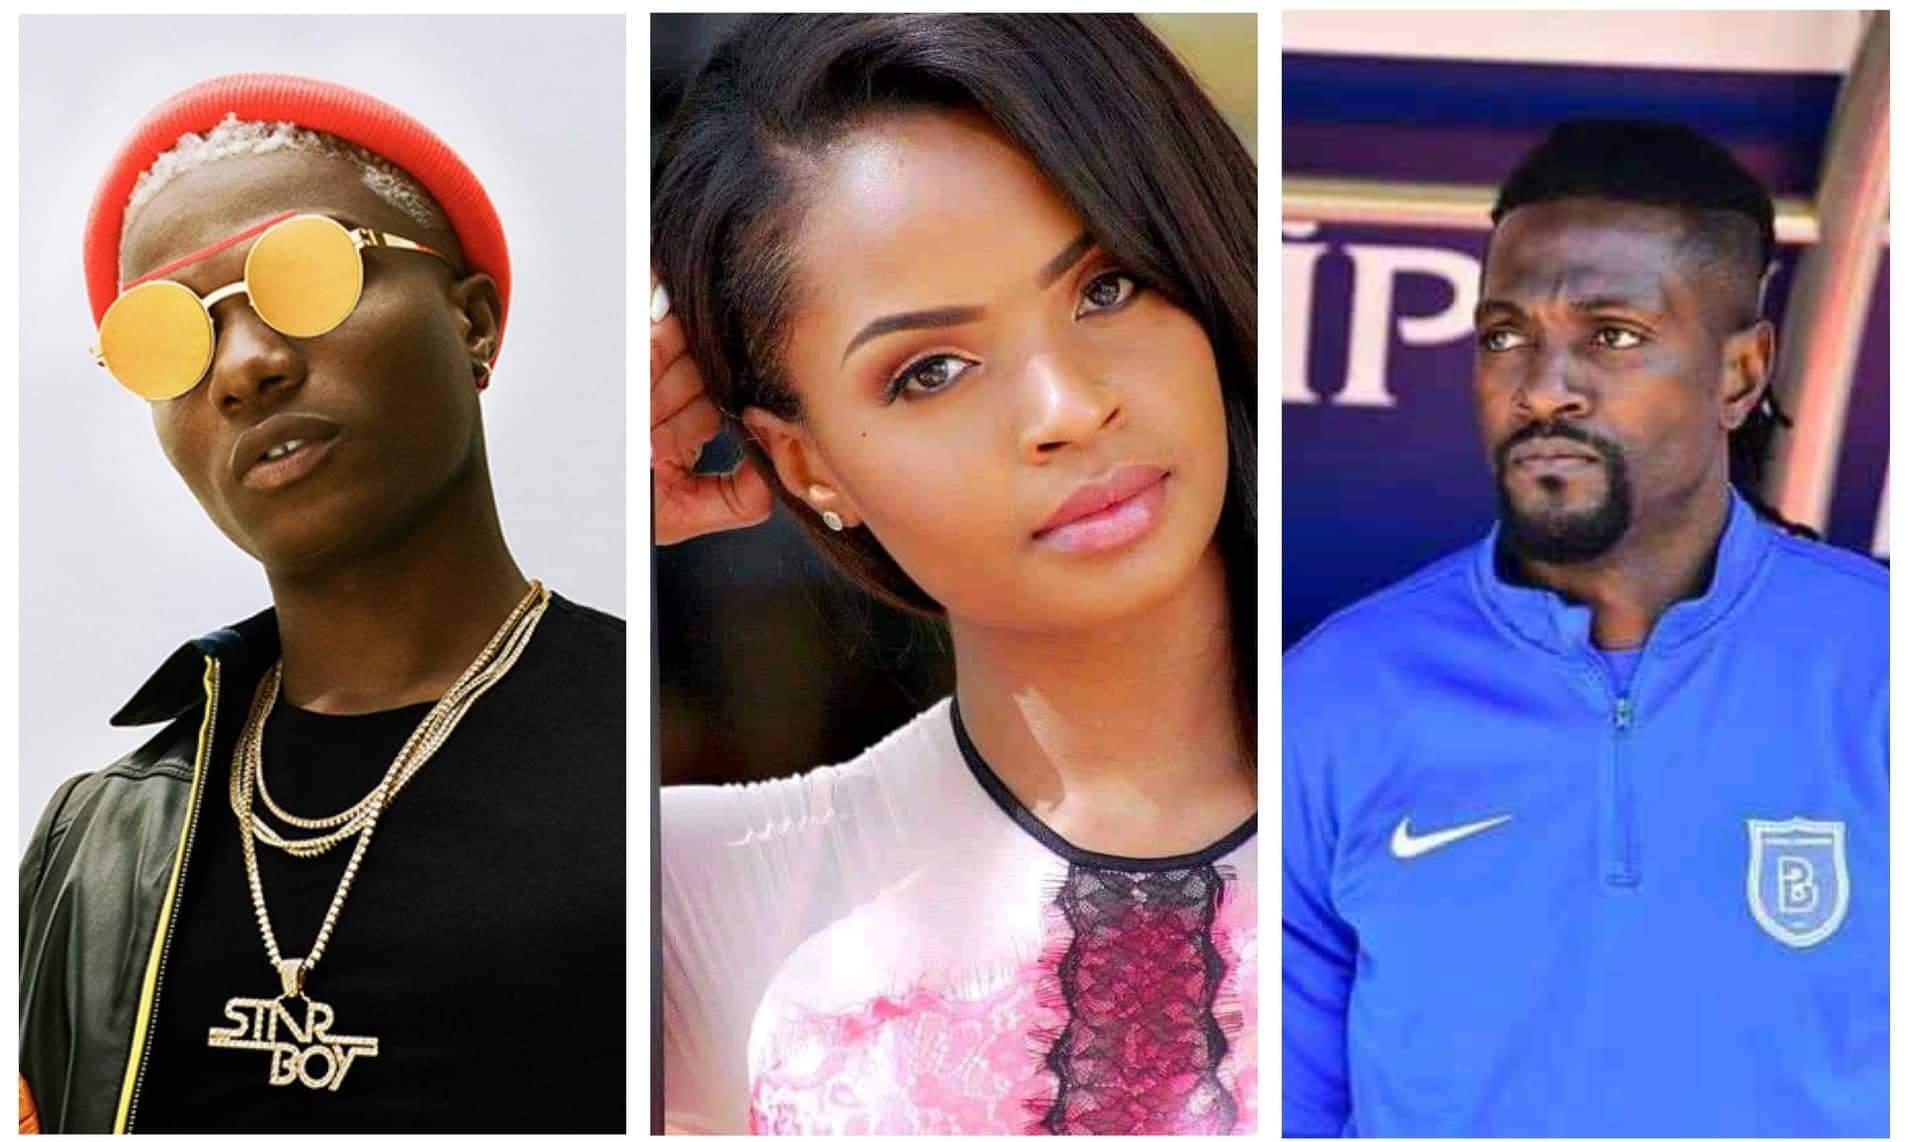 Wizkid serait en couple avec Dillish Mathews l'ex petite amie de Adebayor